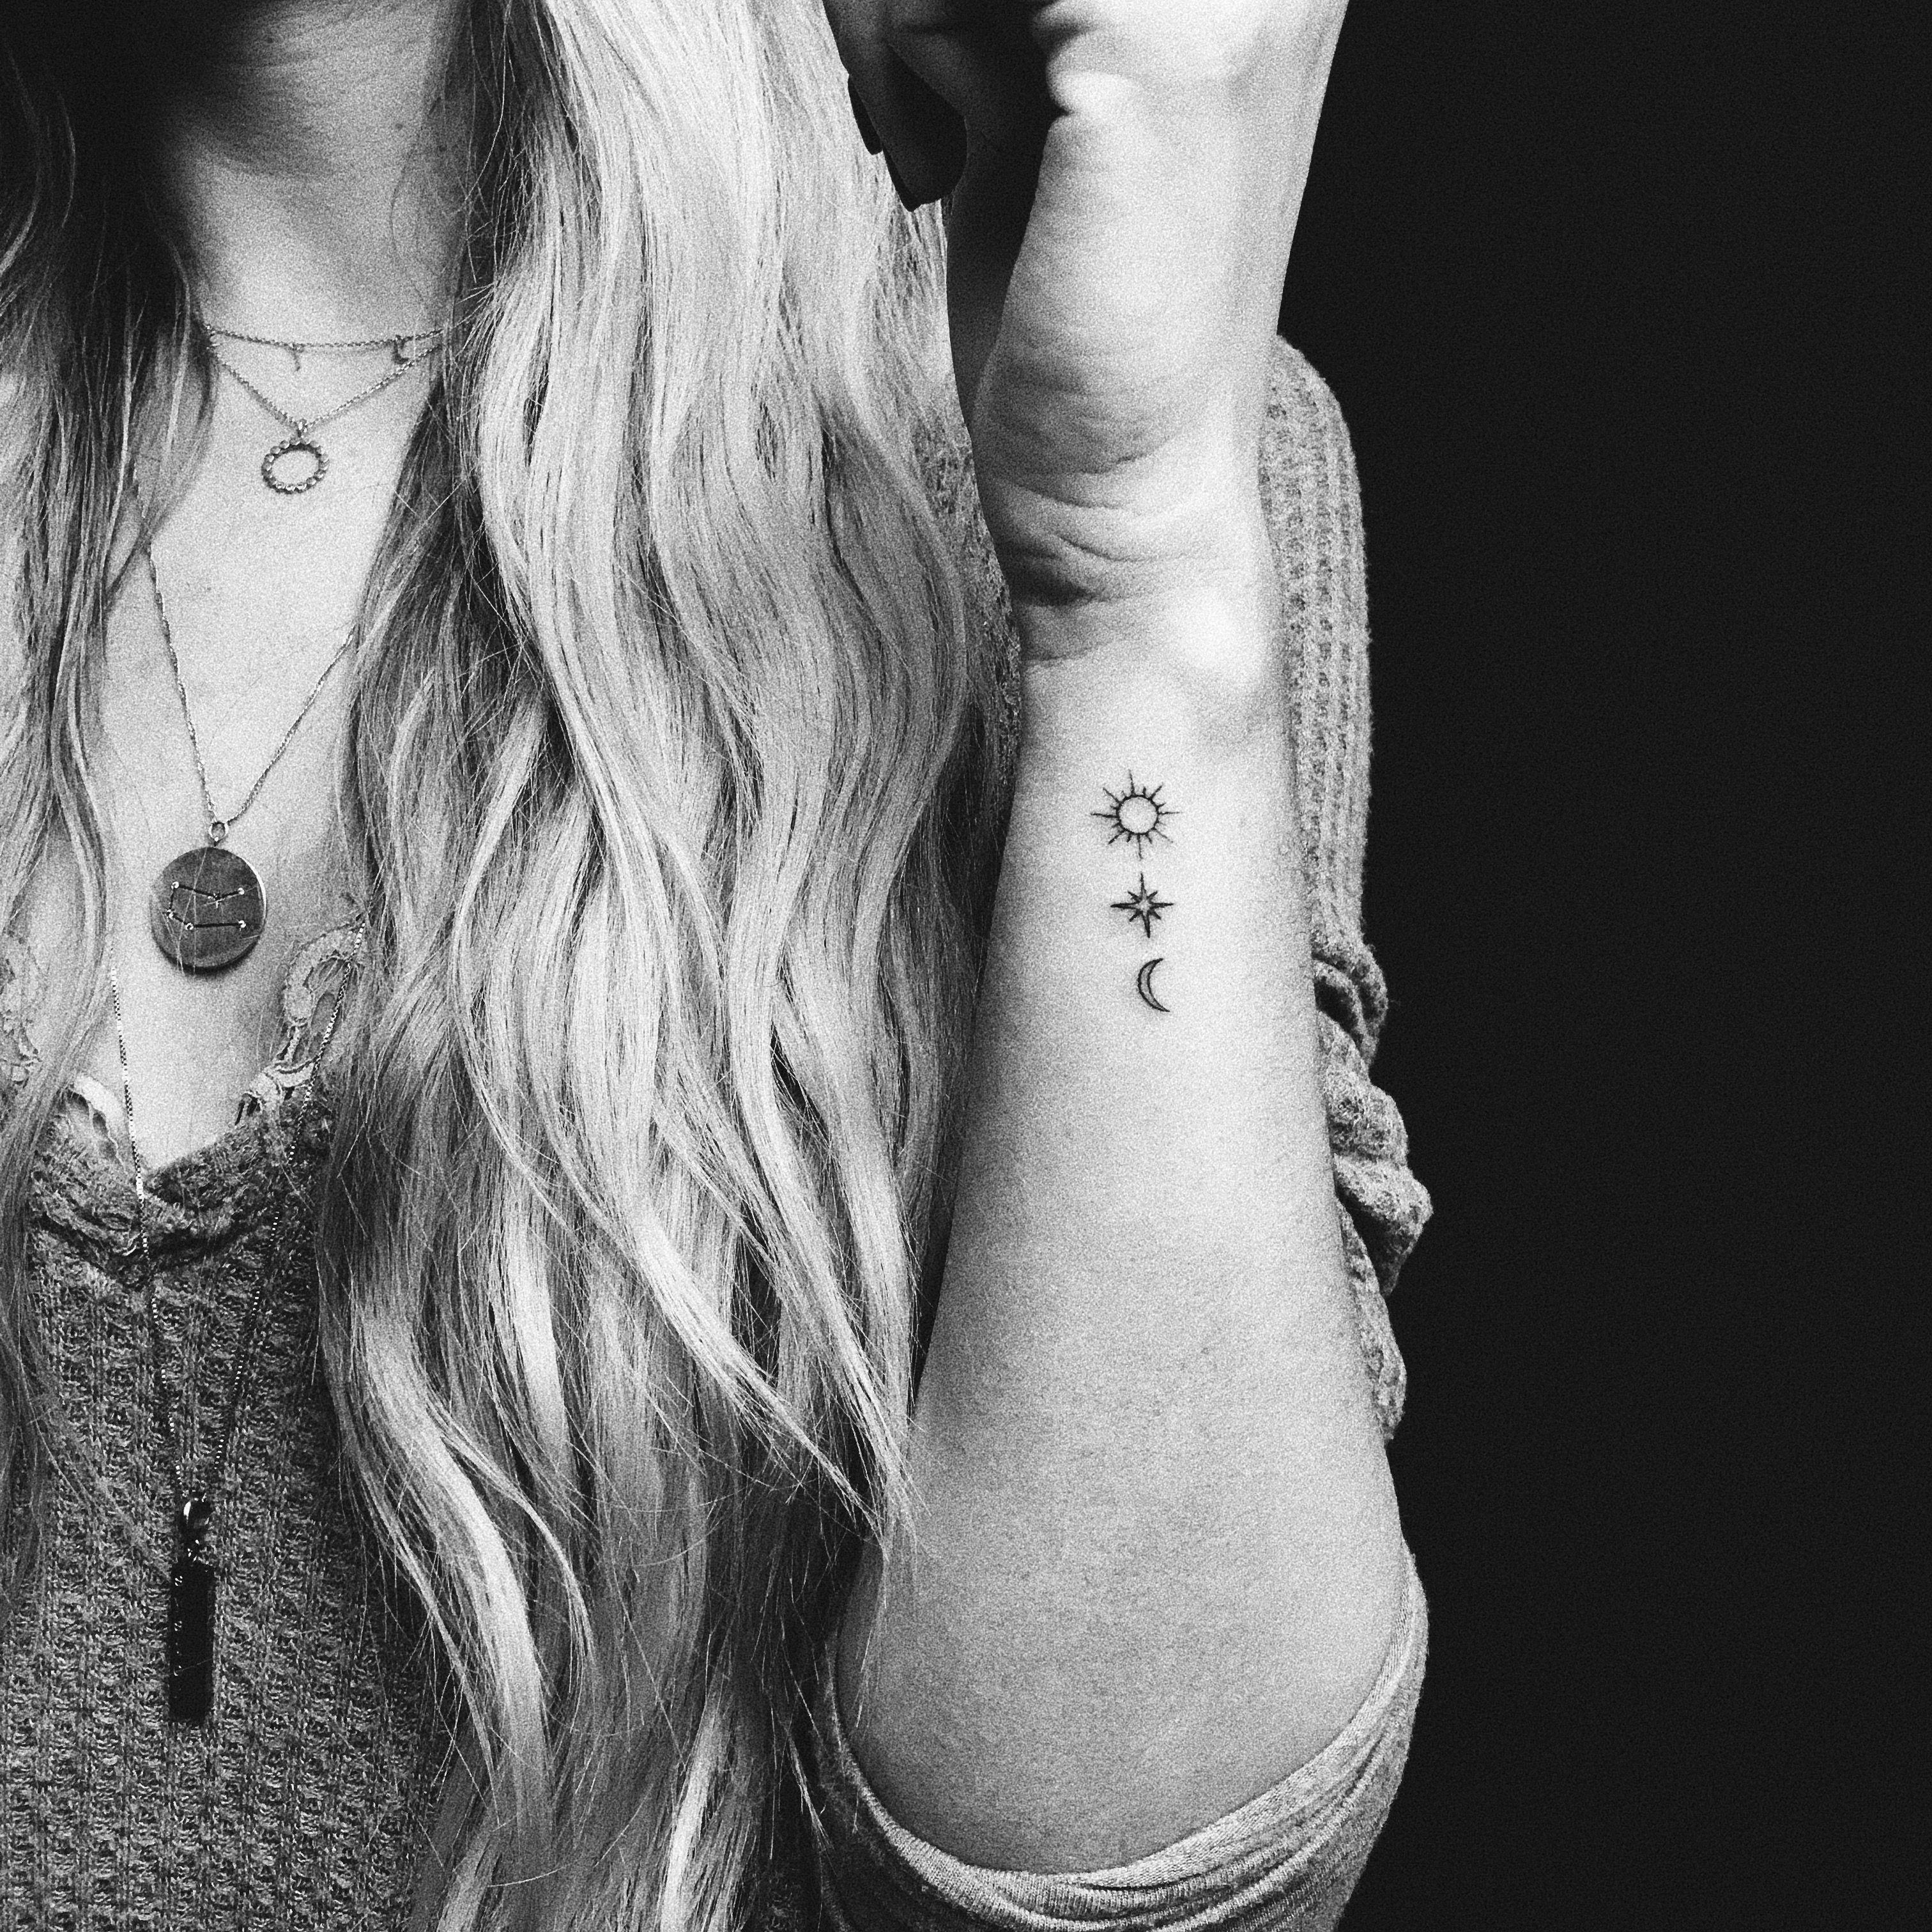 Dainty sun moon and star minimalistic fine line tattoo.